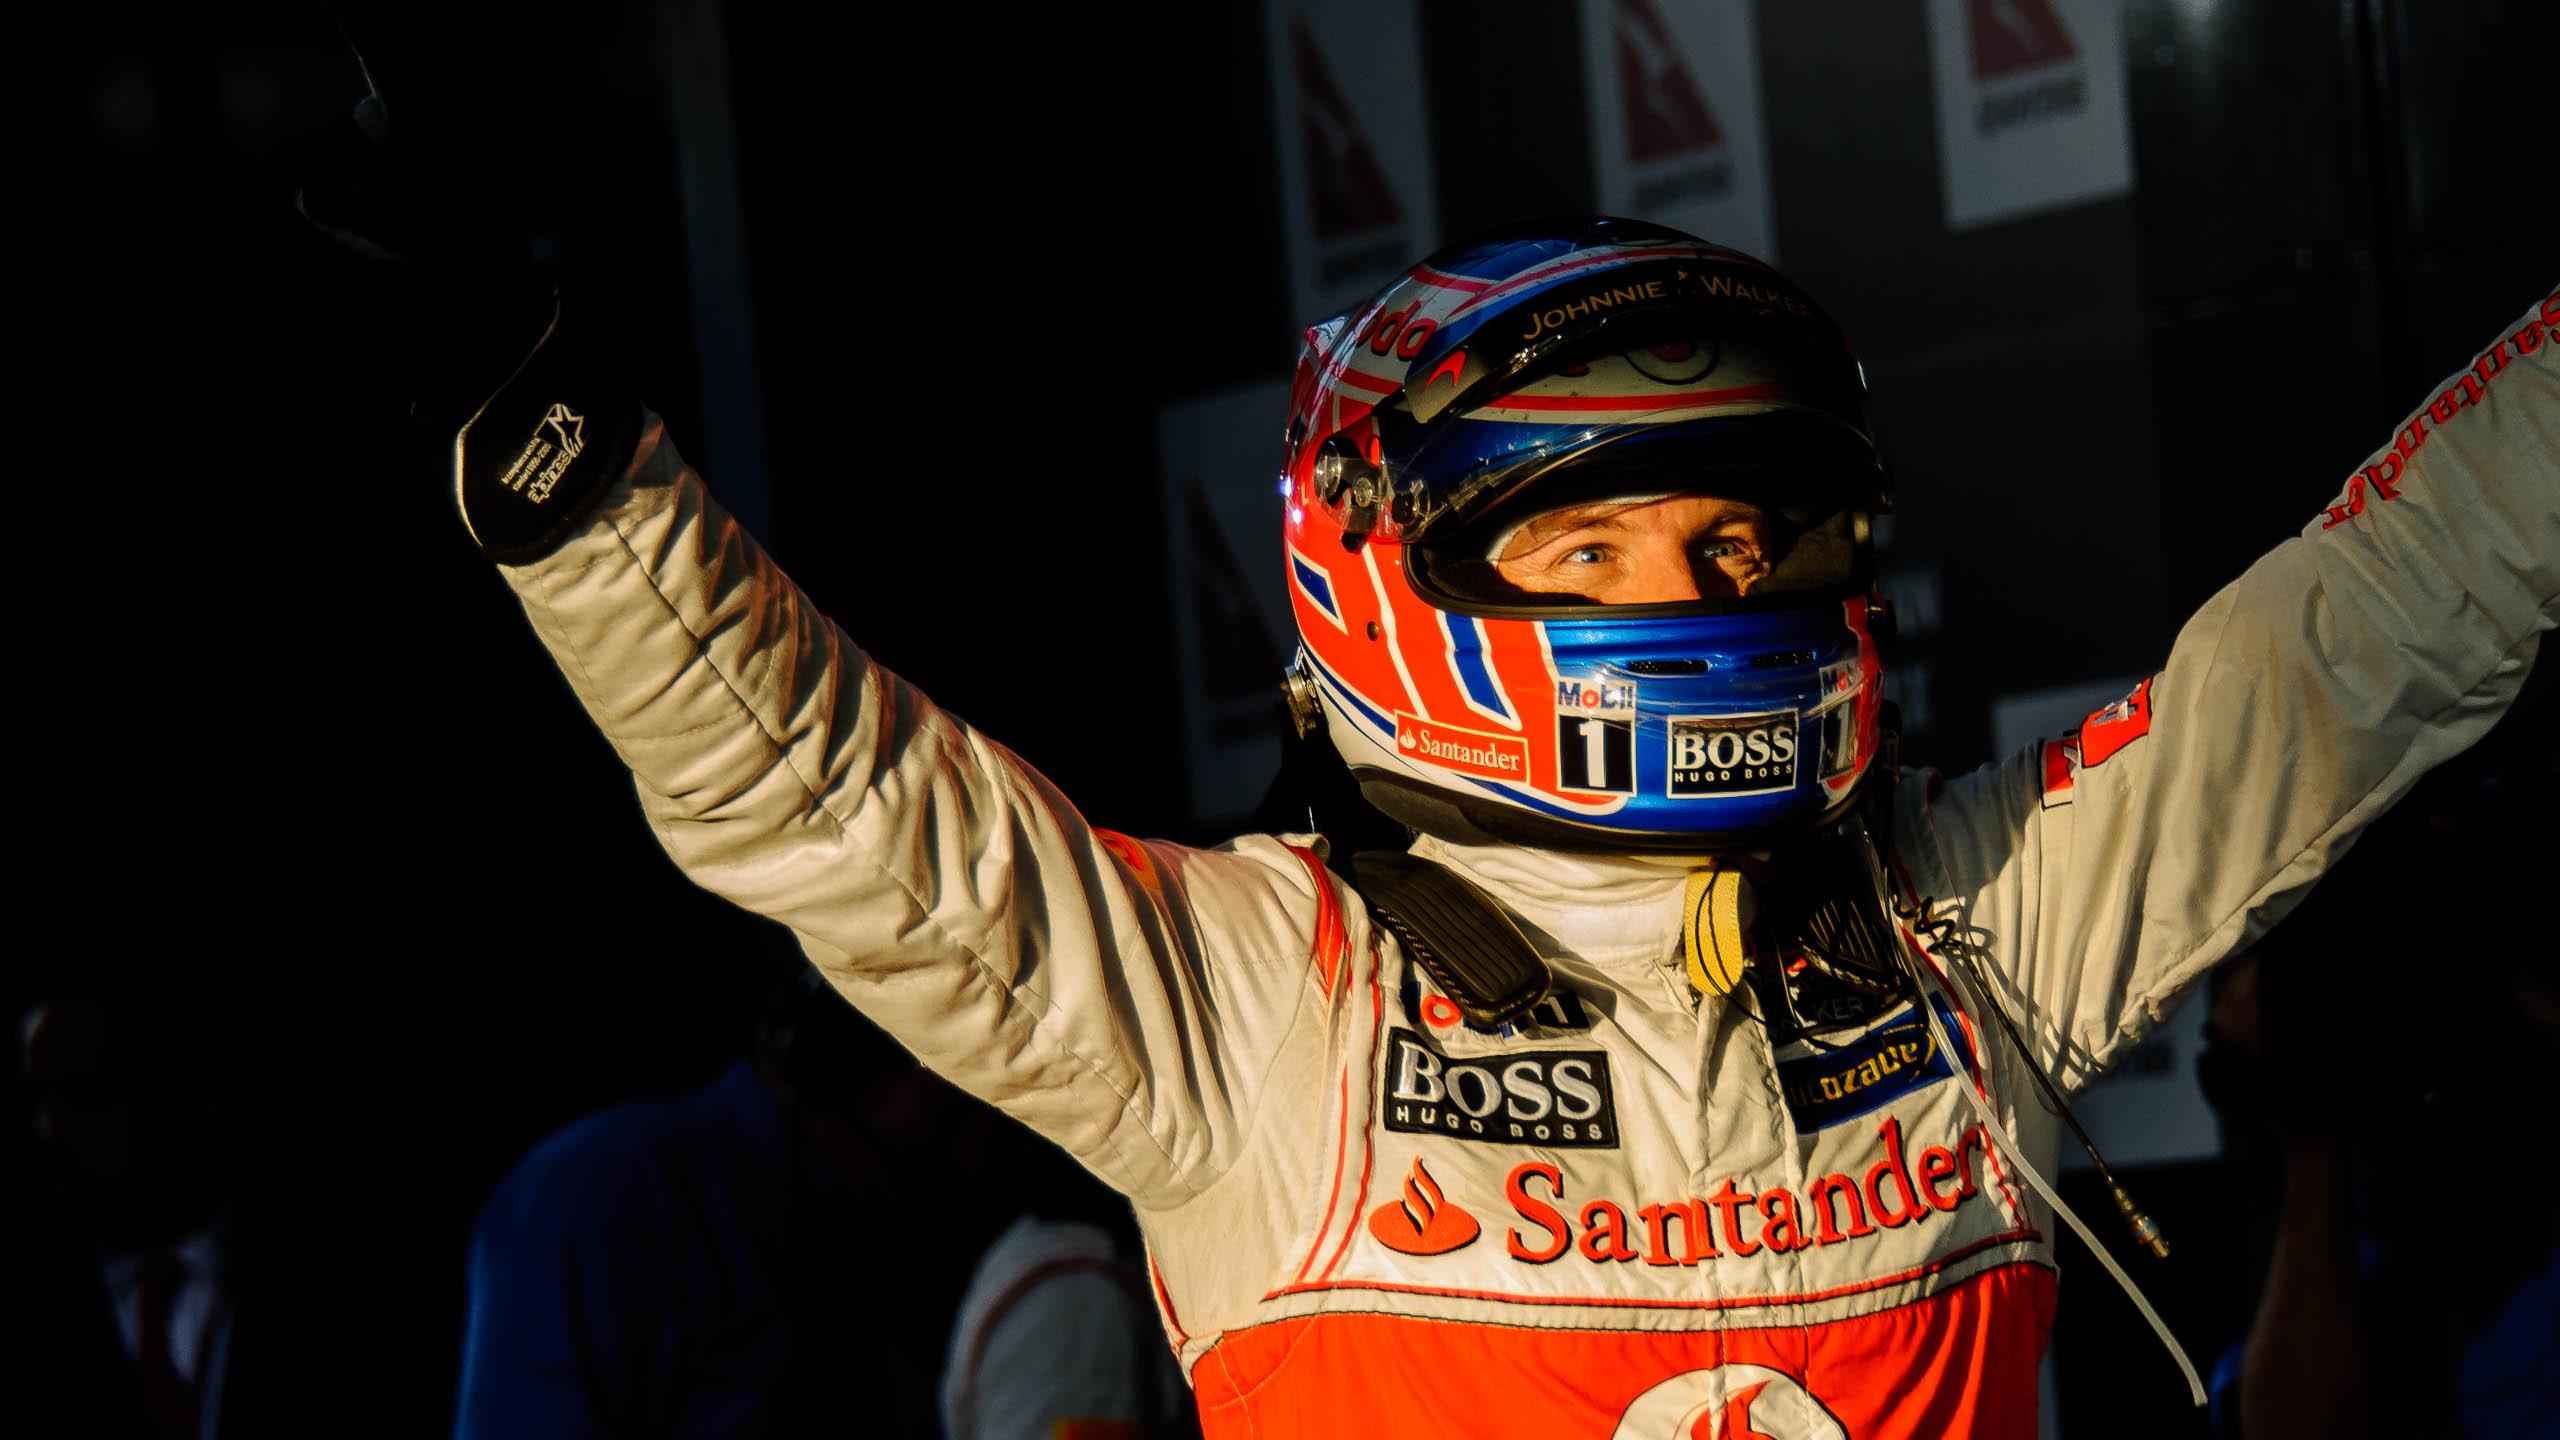 F1 2012 - Rd1 Australian GP - Raceday